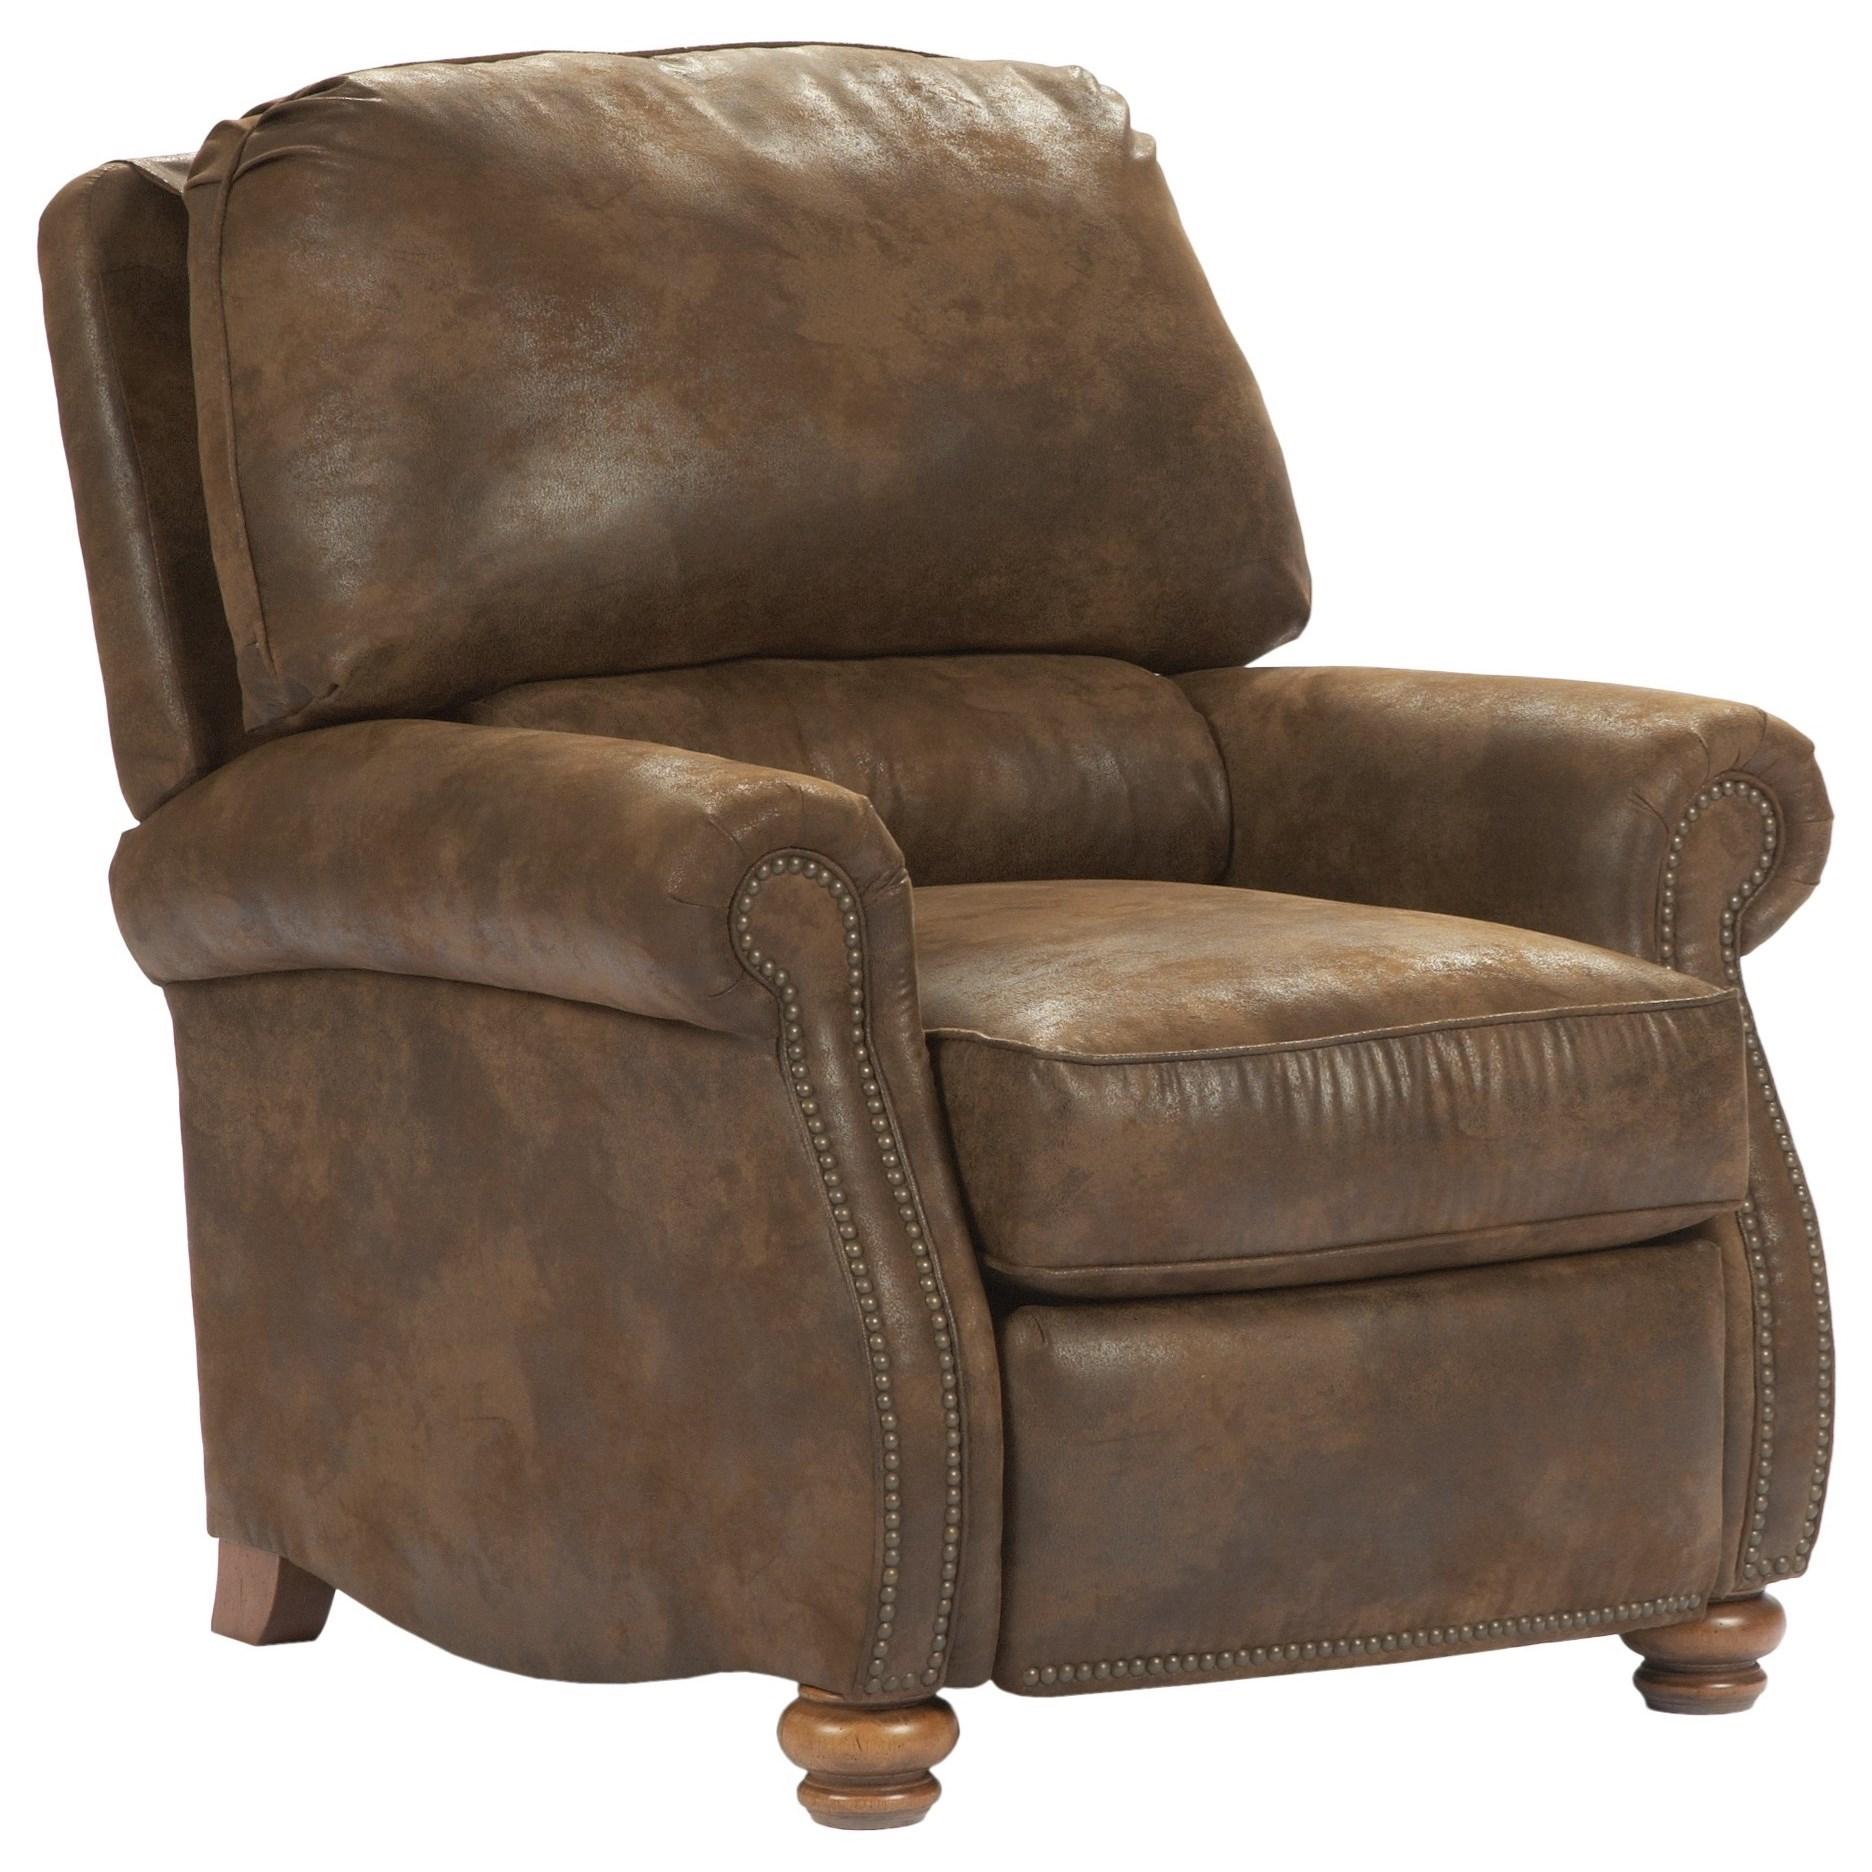 Broyhill Furniture Laramie Recliner with Turned Wood Feet ...